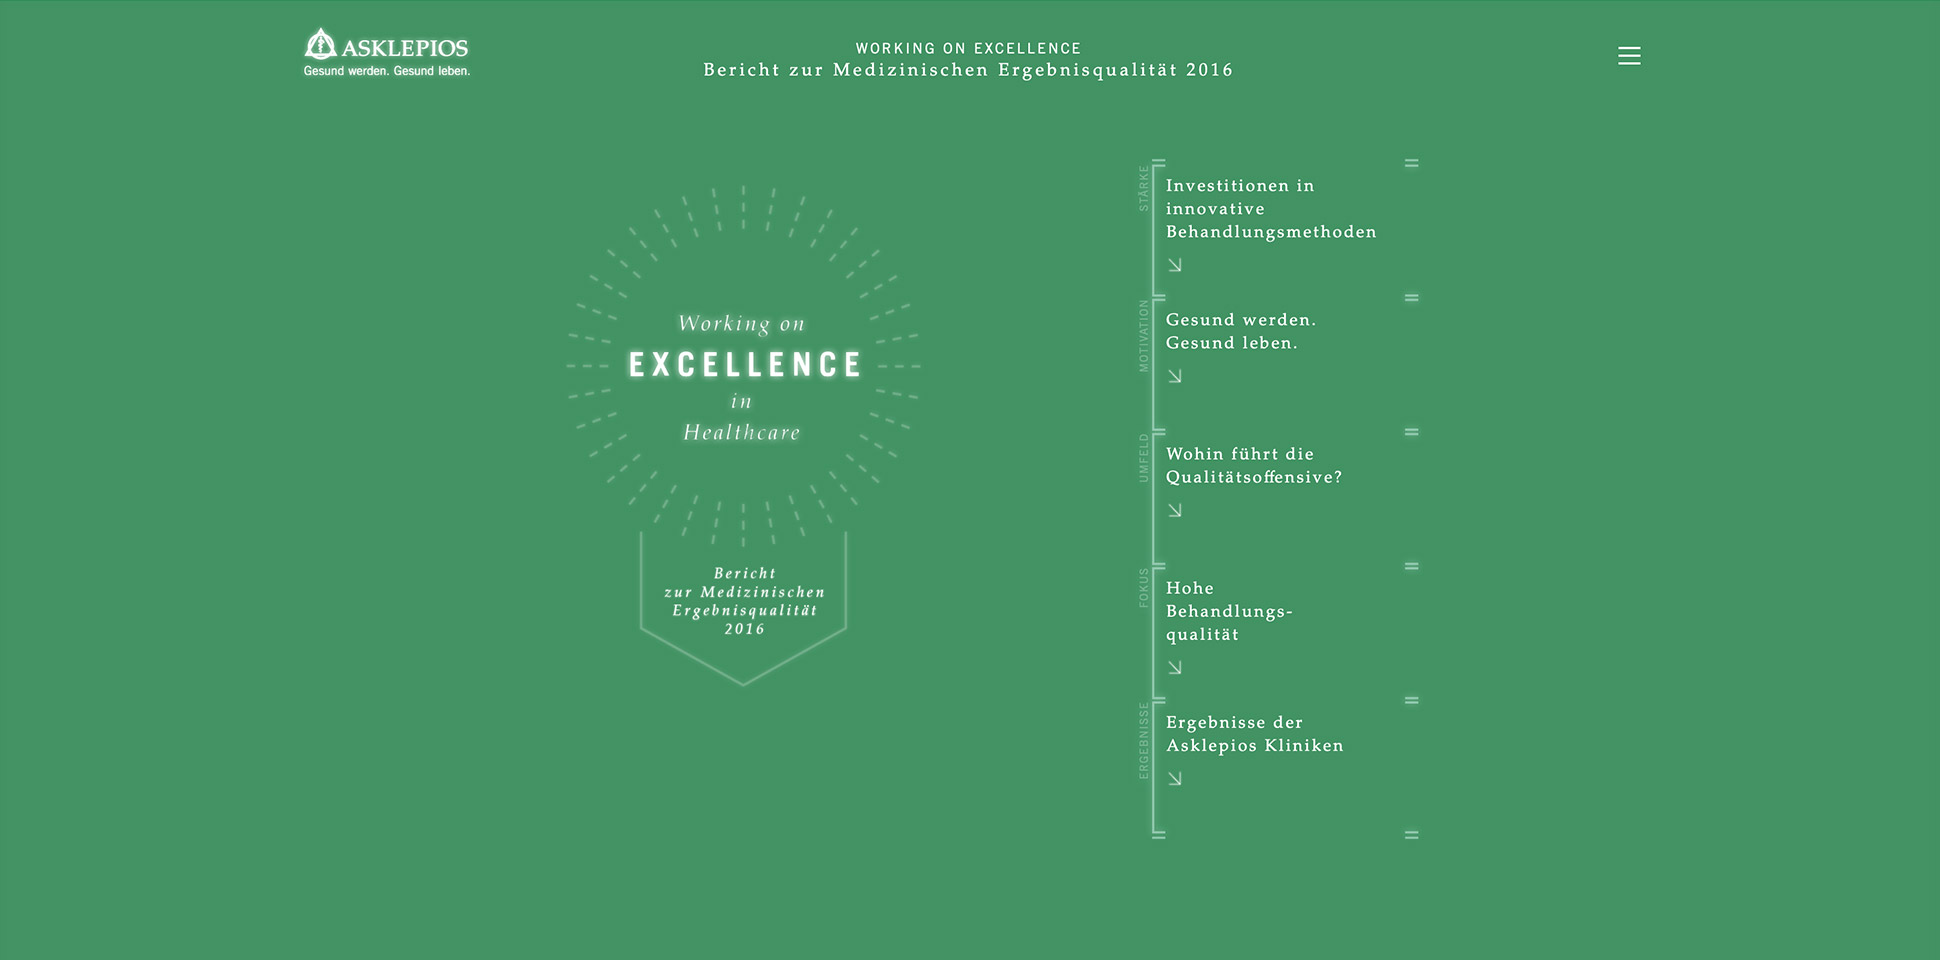 asklepios qualitaetsbericht inhalt 2016 polarwerk